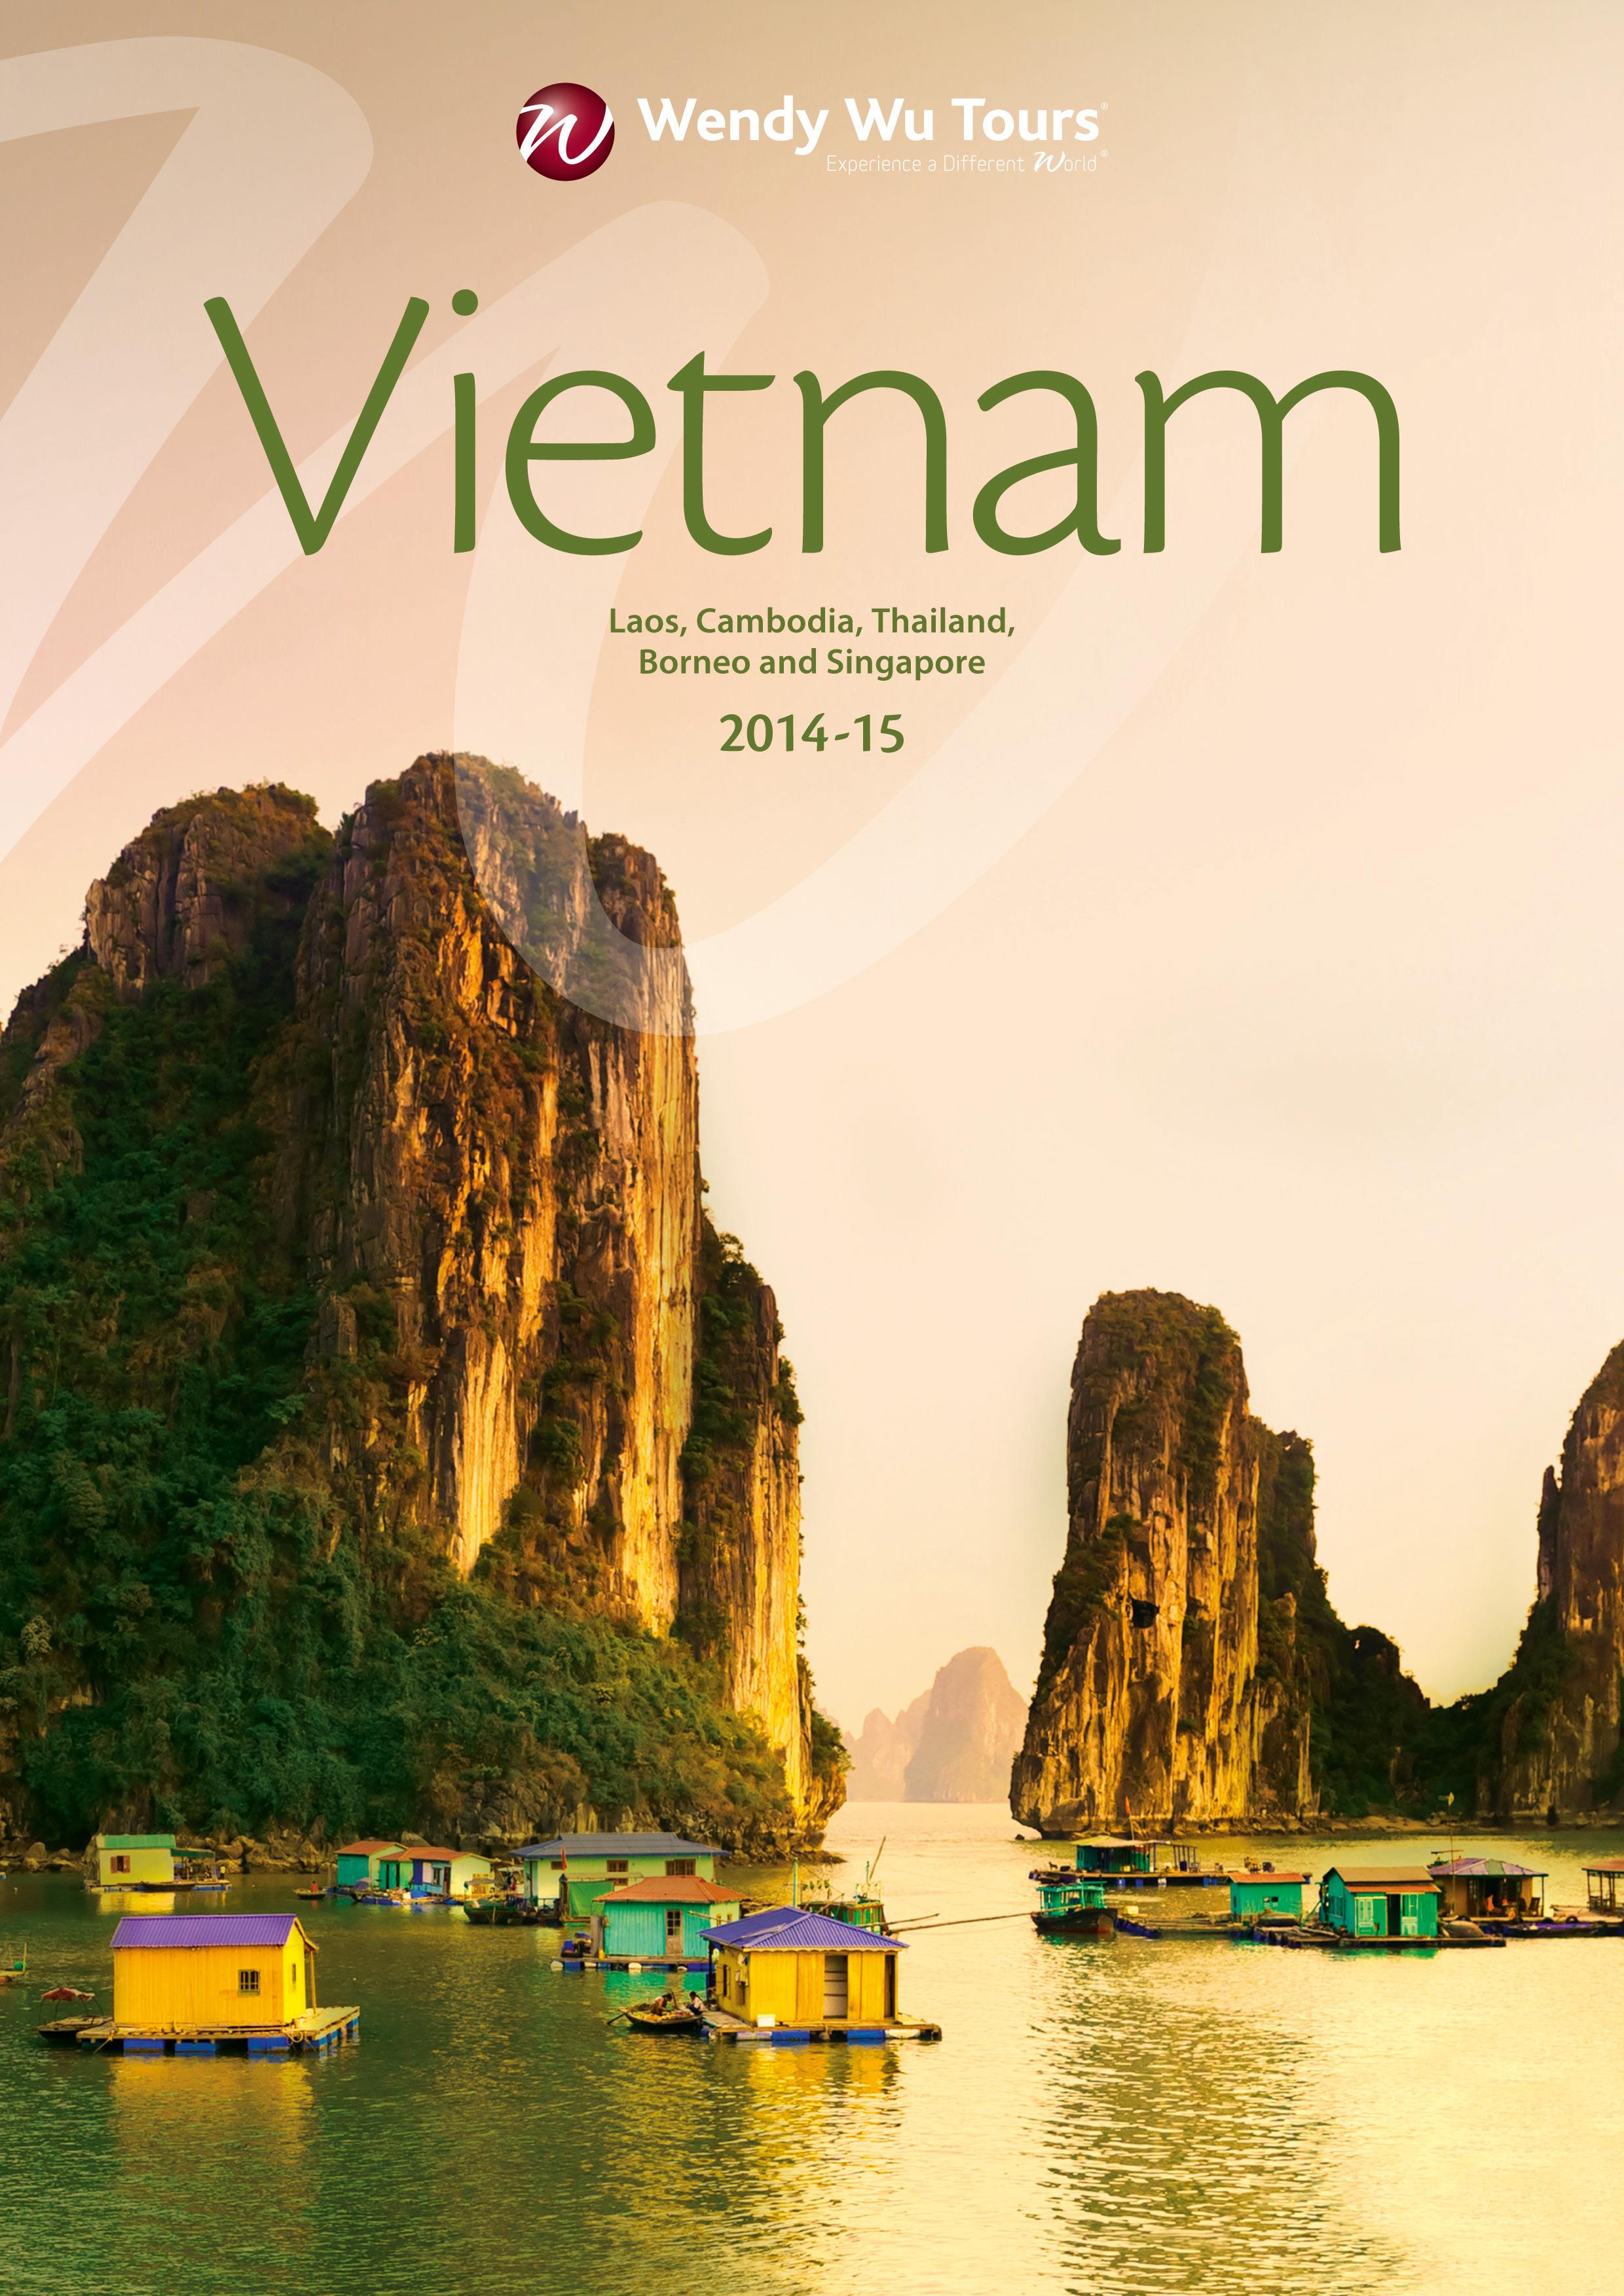 Travel Daily | Wendy Wu Tours 2014/15 Vietnam brochure